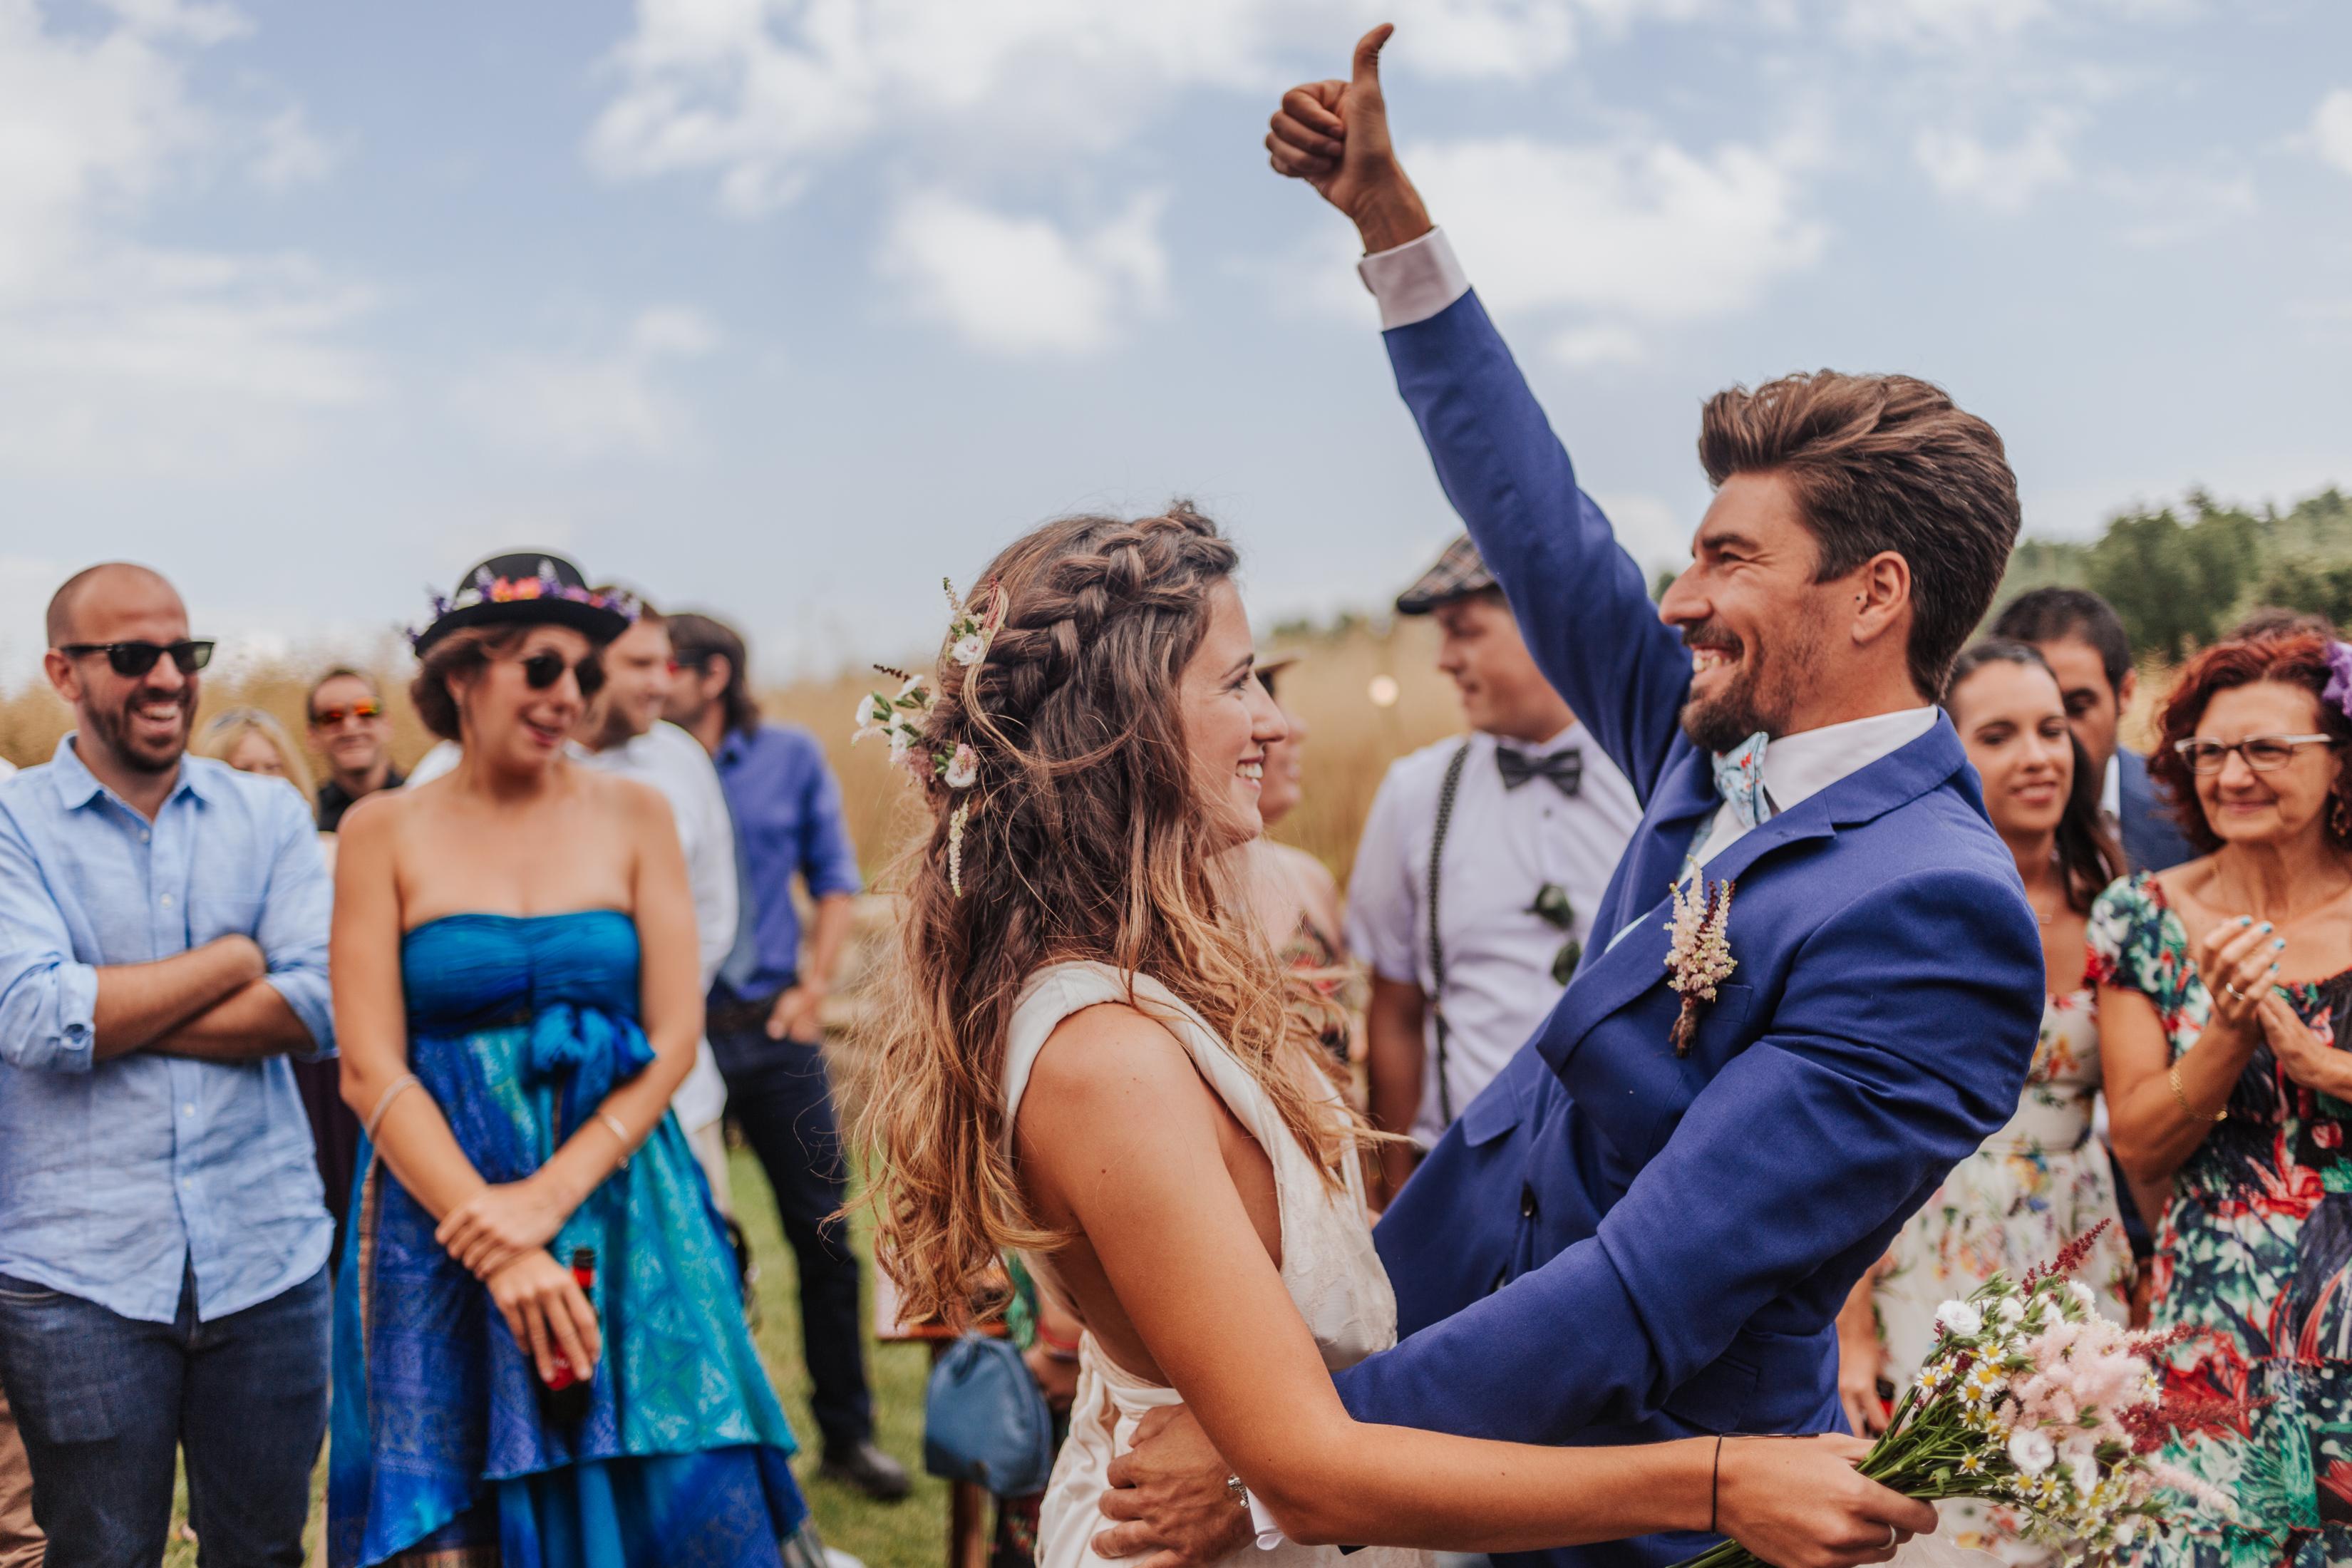 fotógrafo de bodas :: boda en el campo :: boda en masía :: casaments al bosc :: nómades :: boda diferente :: boda al aire libre :: fotógrafo de bodas barcelona :: boda en berga :: fotógrafo de bodas berga